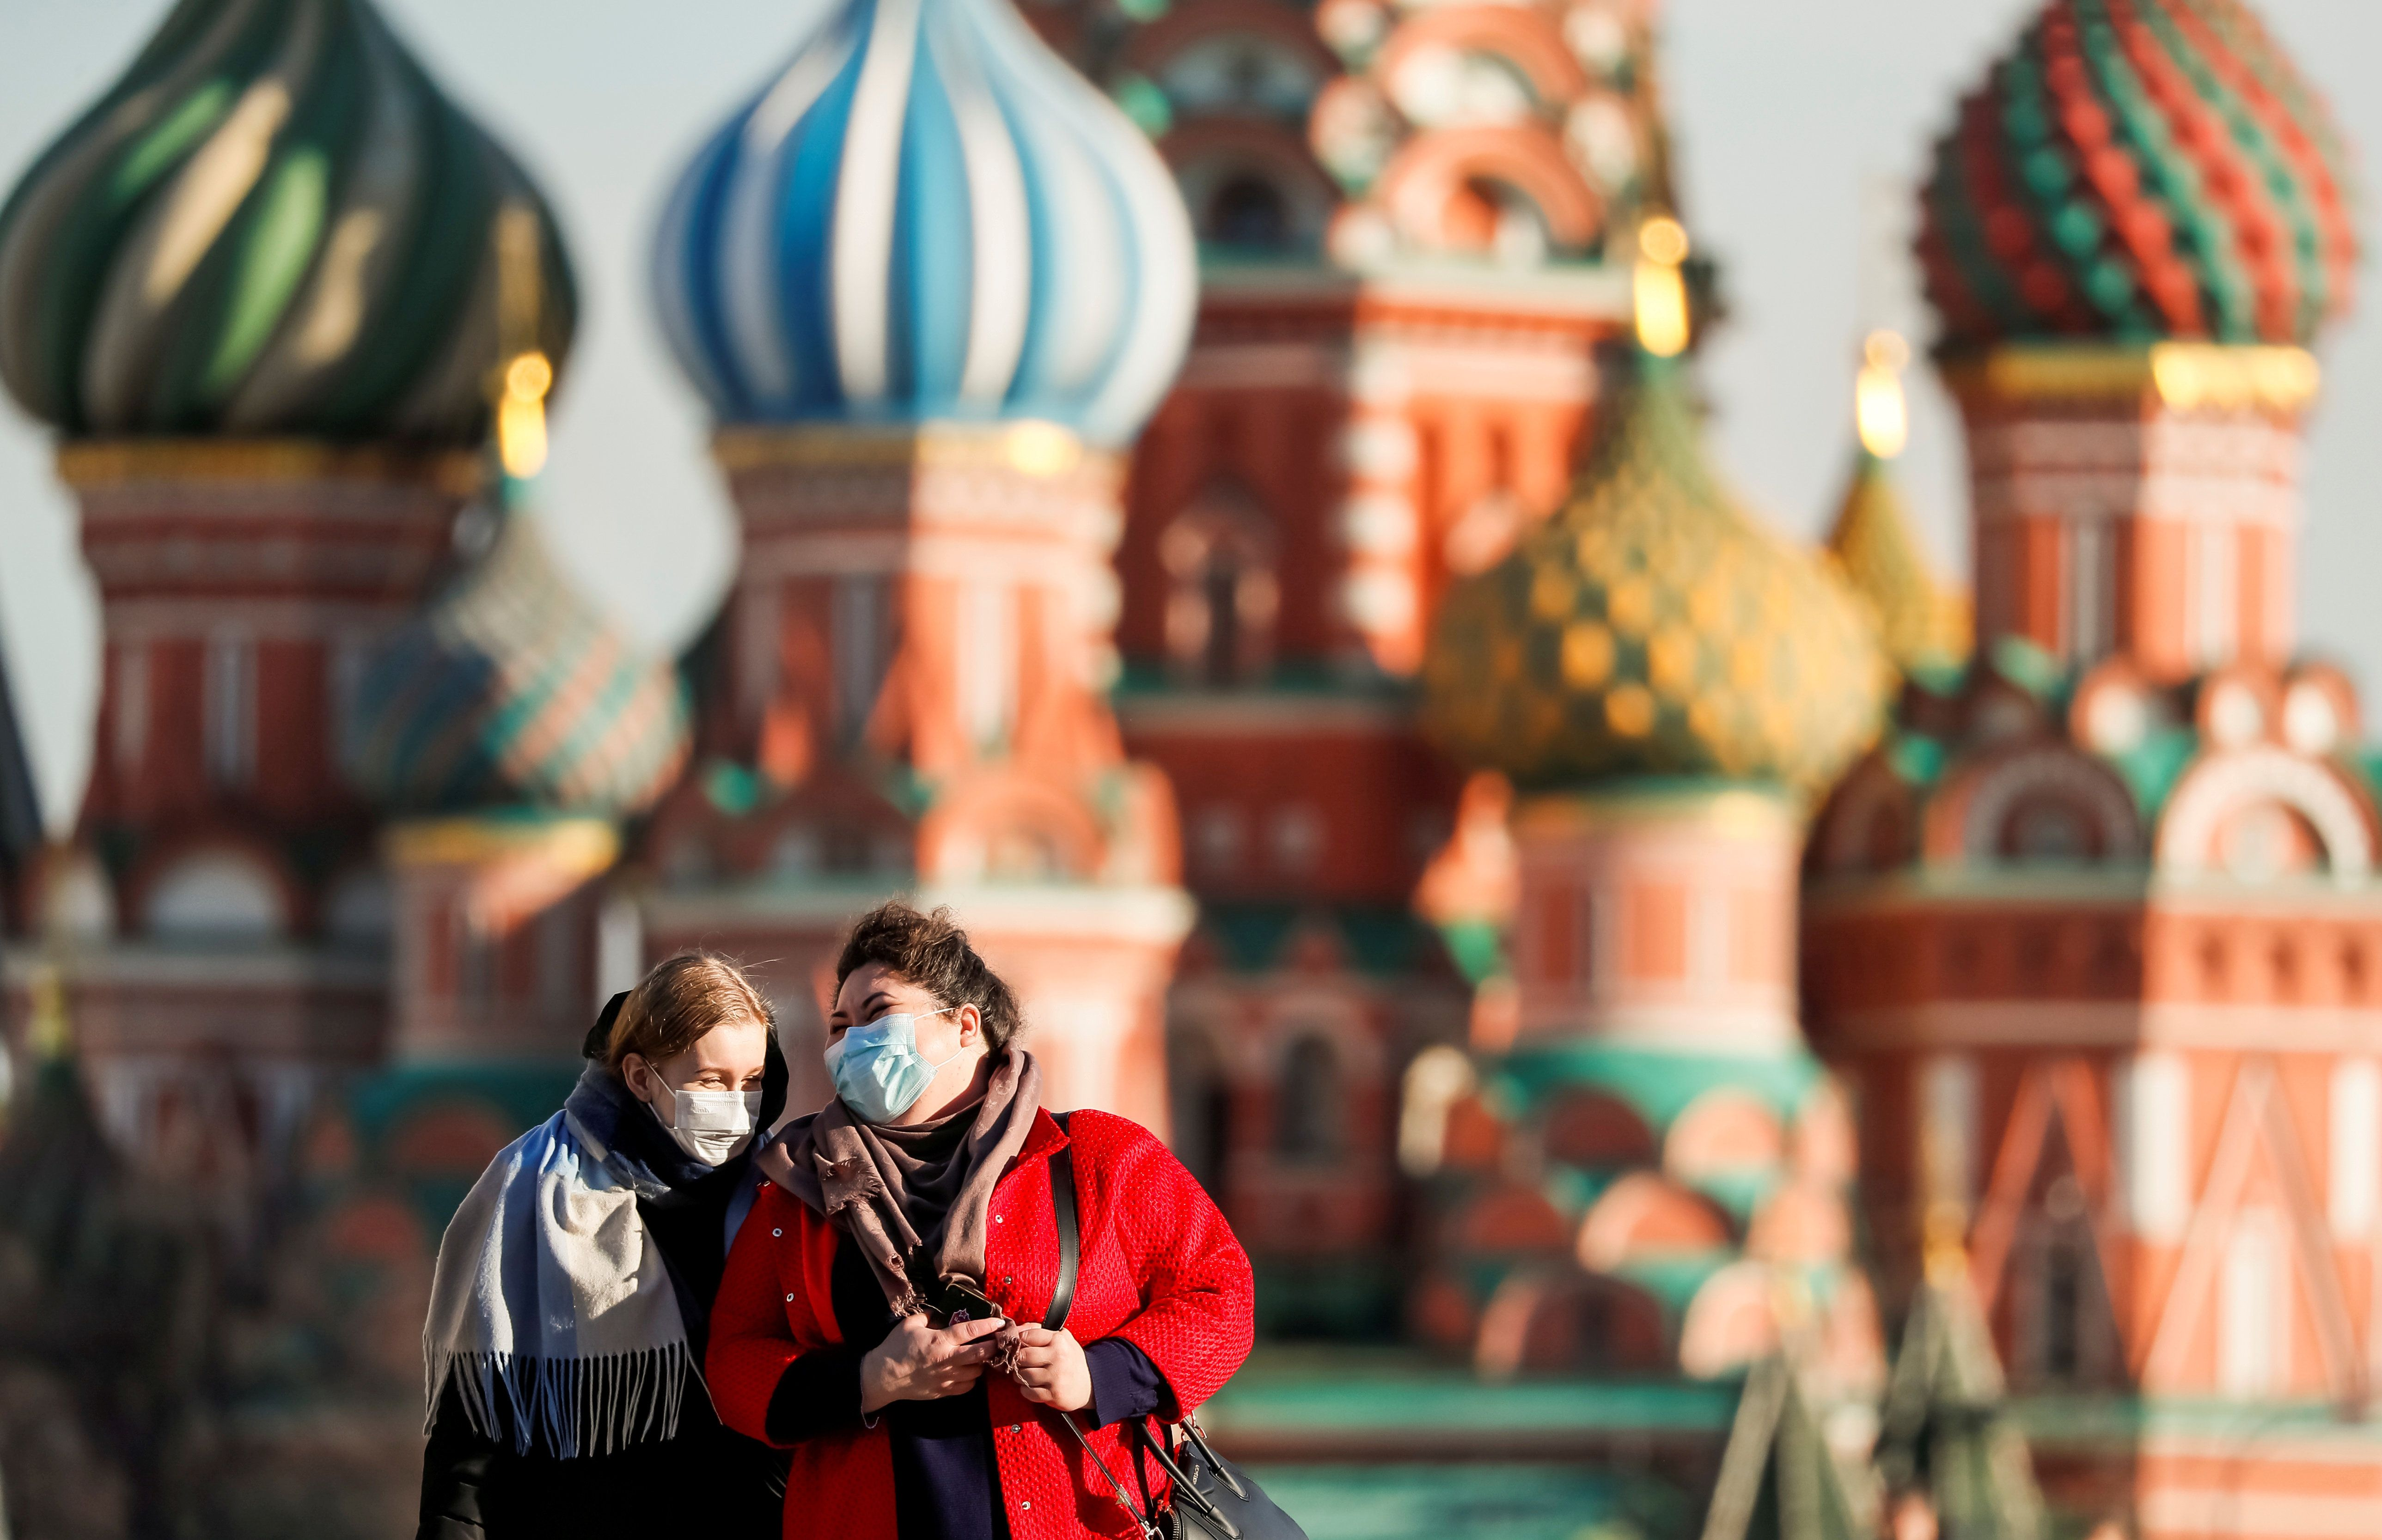 Coronavirus Politics Daily: Moscow lockdown, migrant children, Orban's power grab